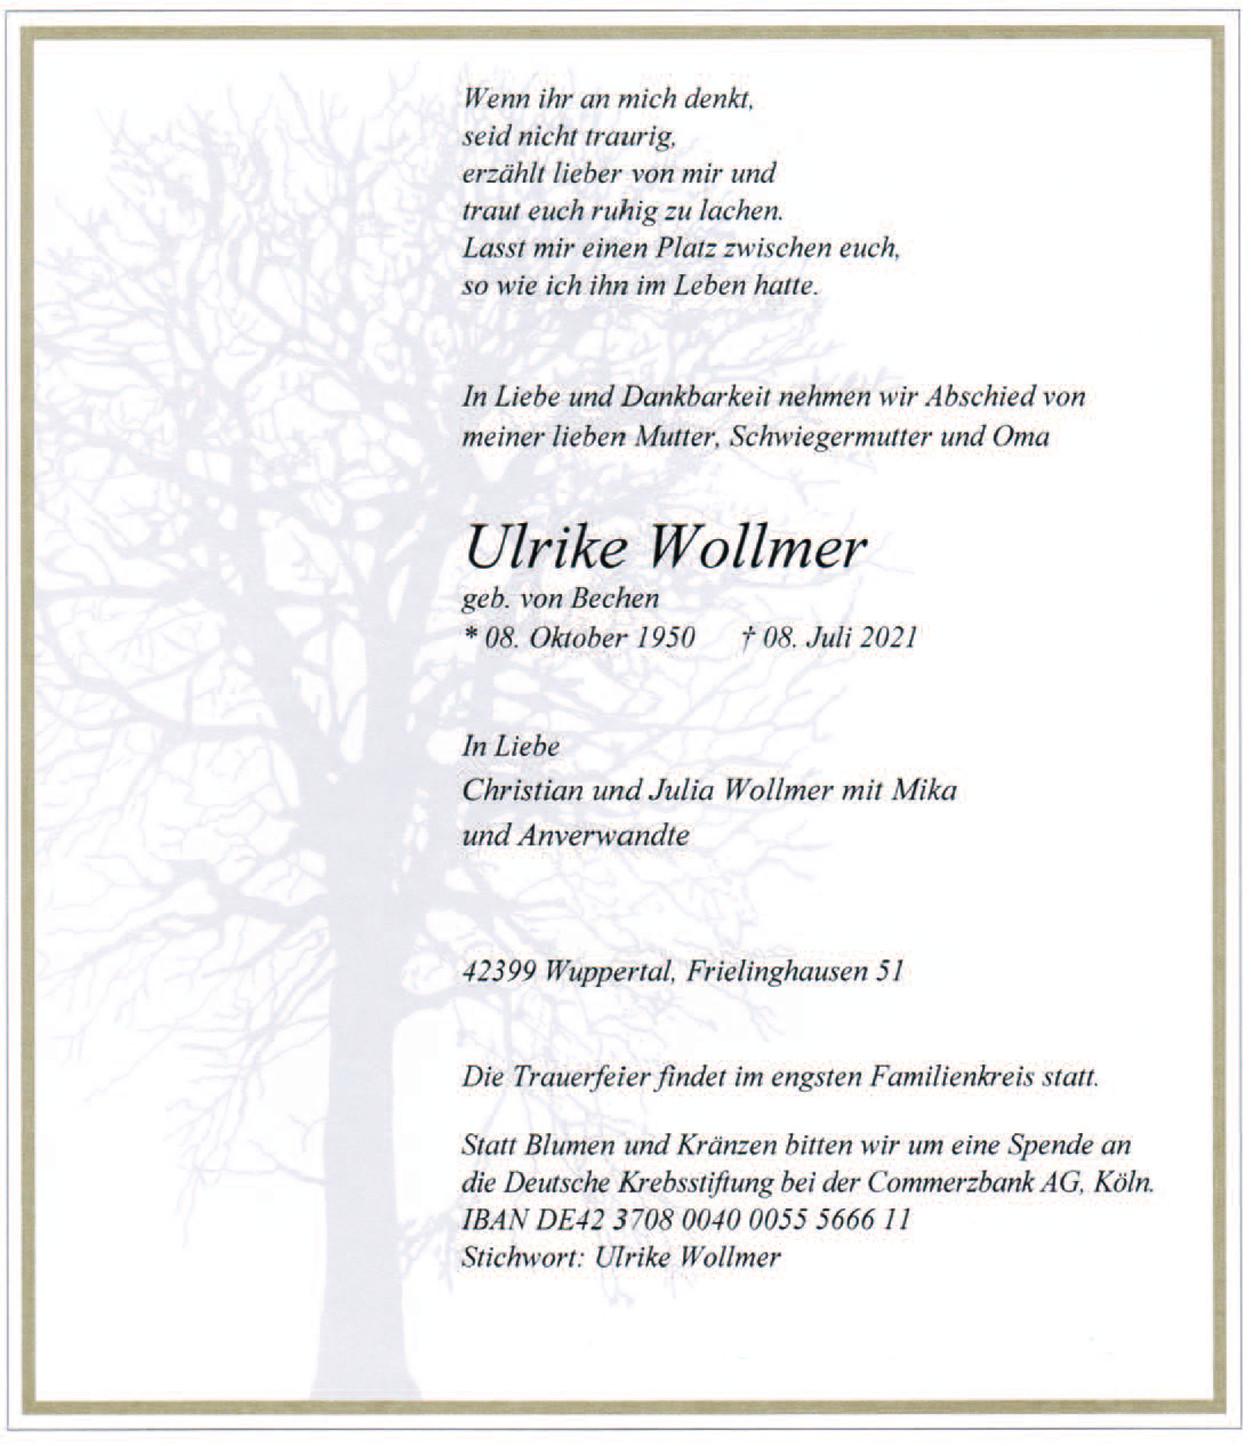 Ulrike Wollmer